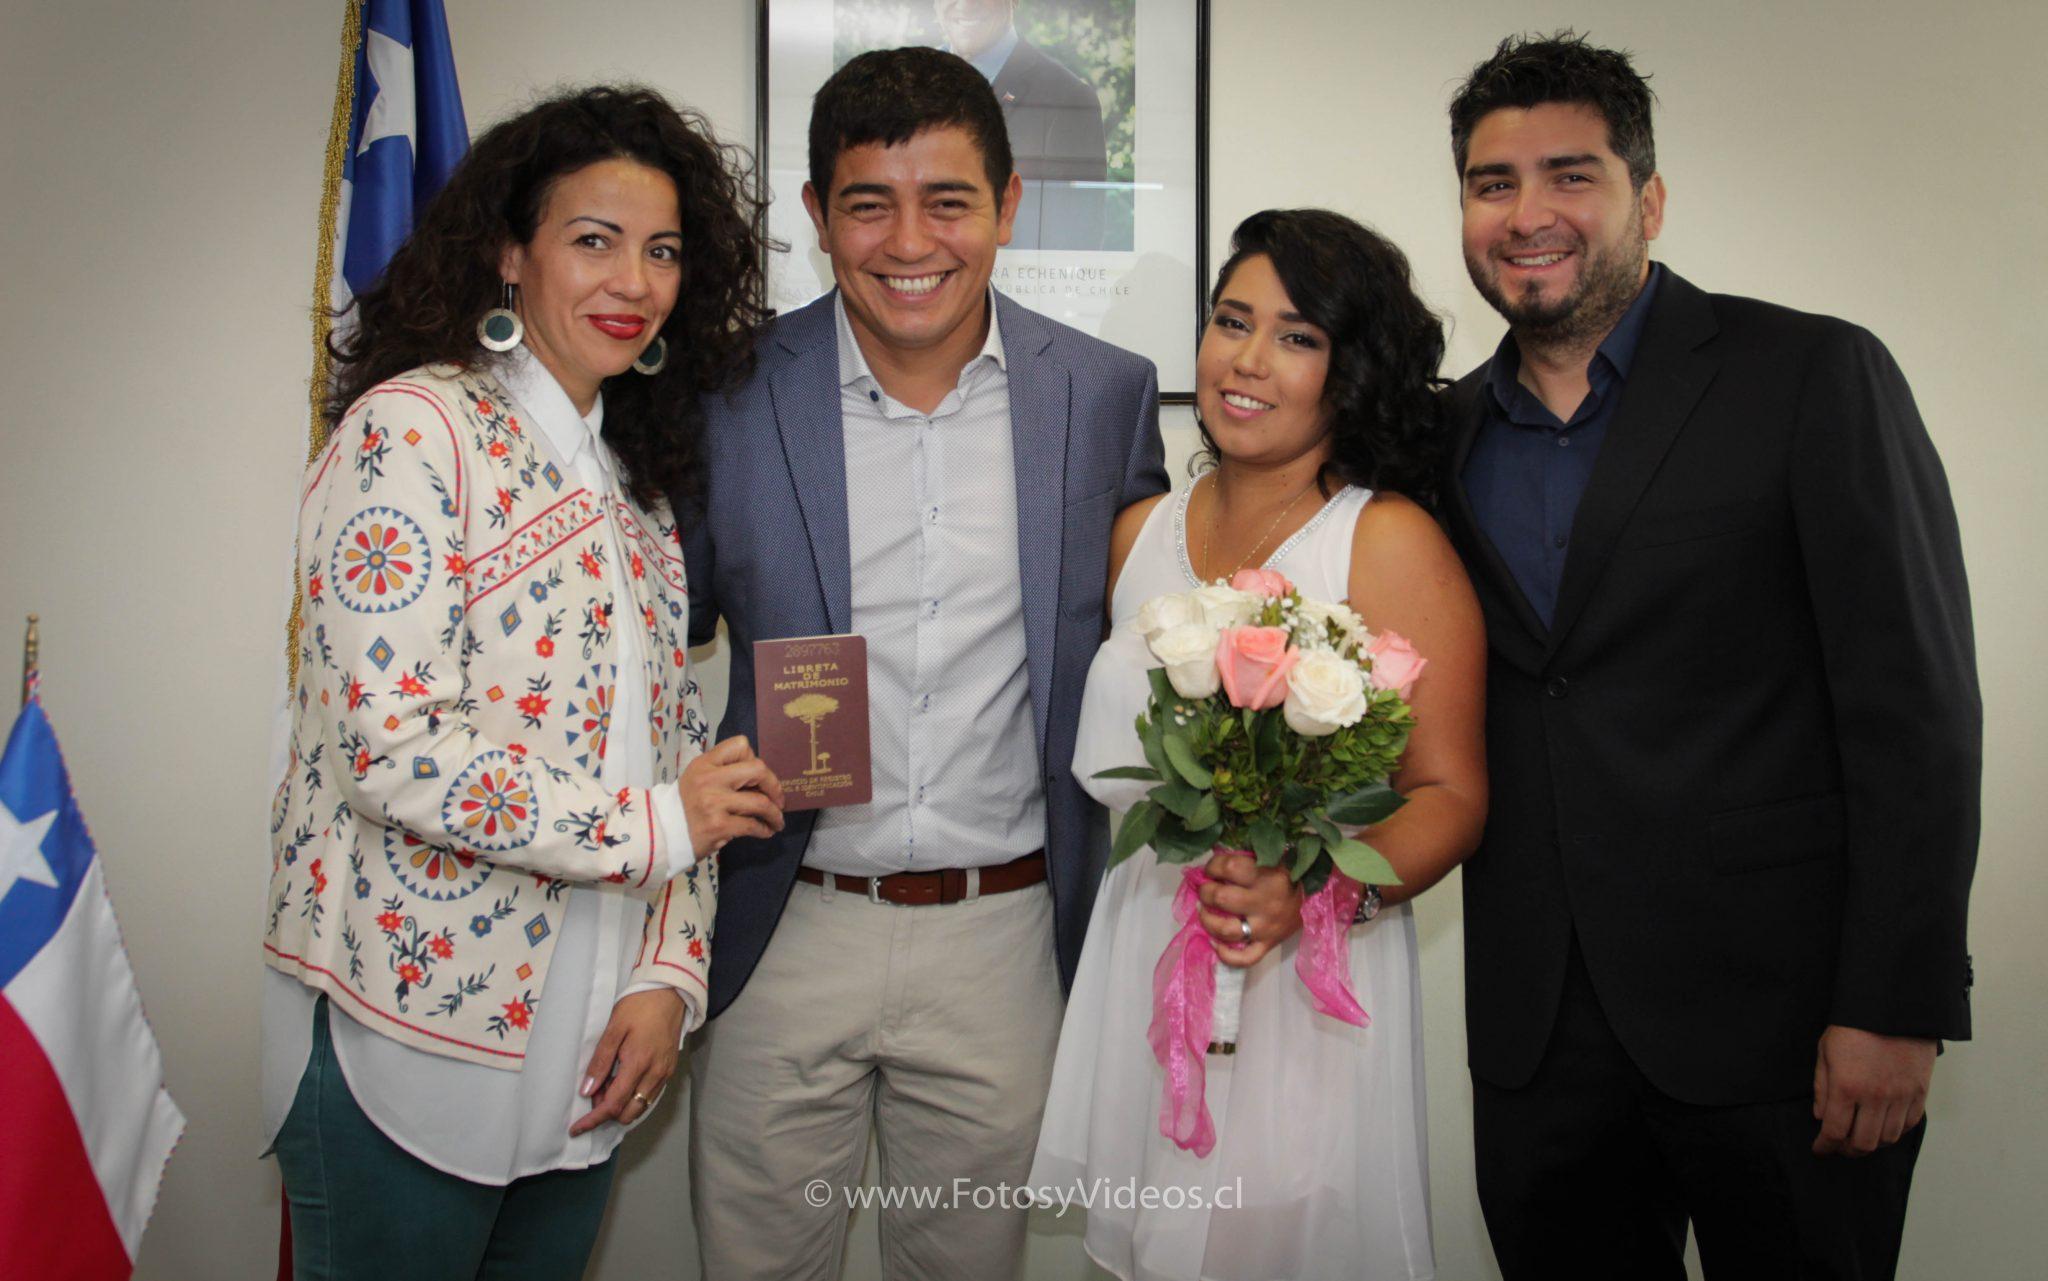 Matrimonio Registro Civil : El registro civil lanza la oficina de matrimonio a domicilio